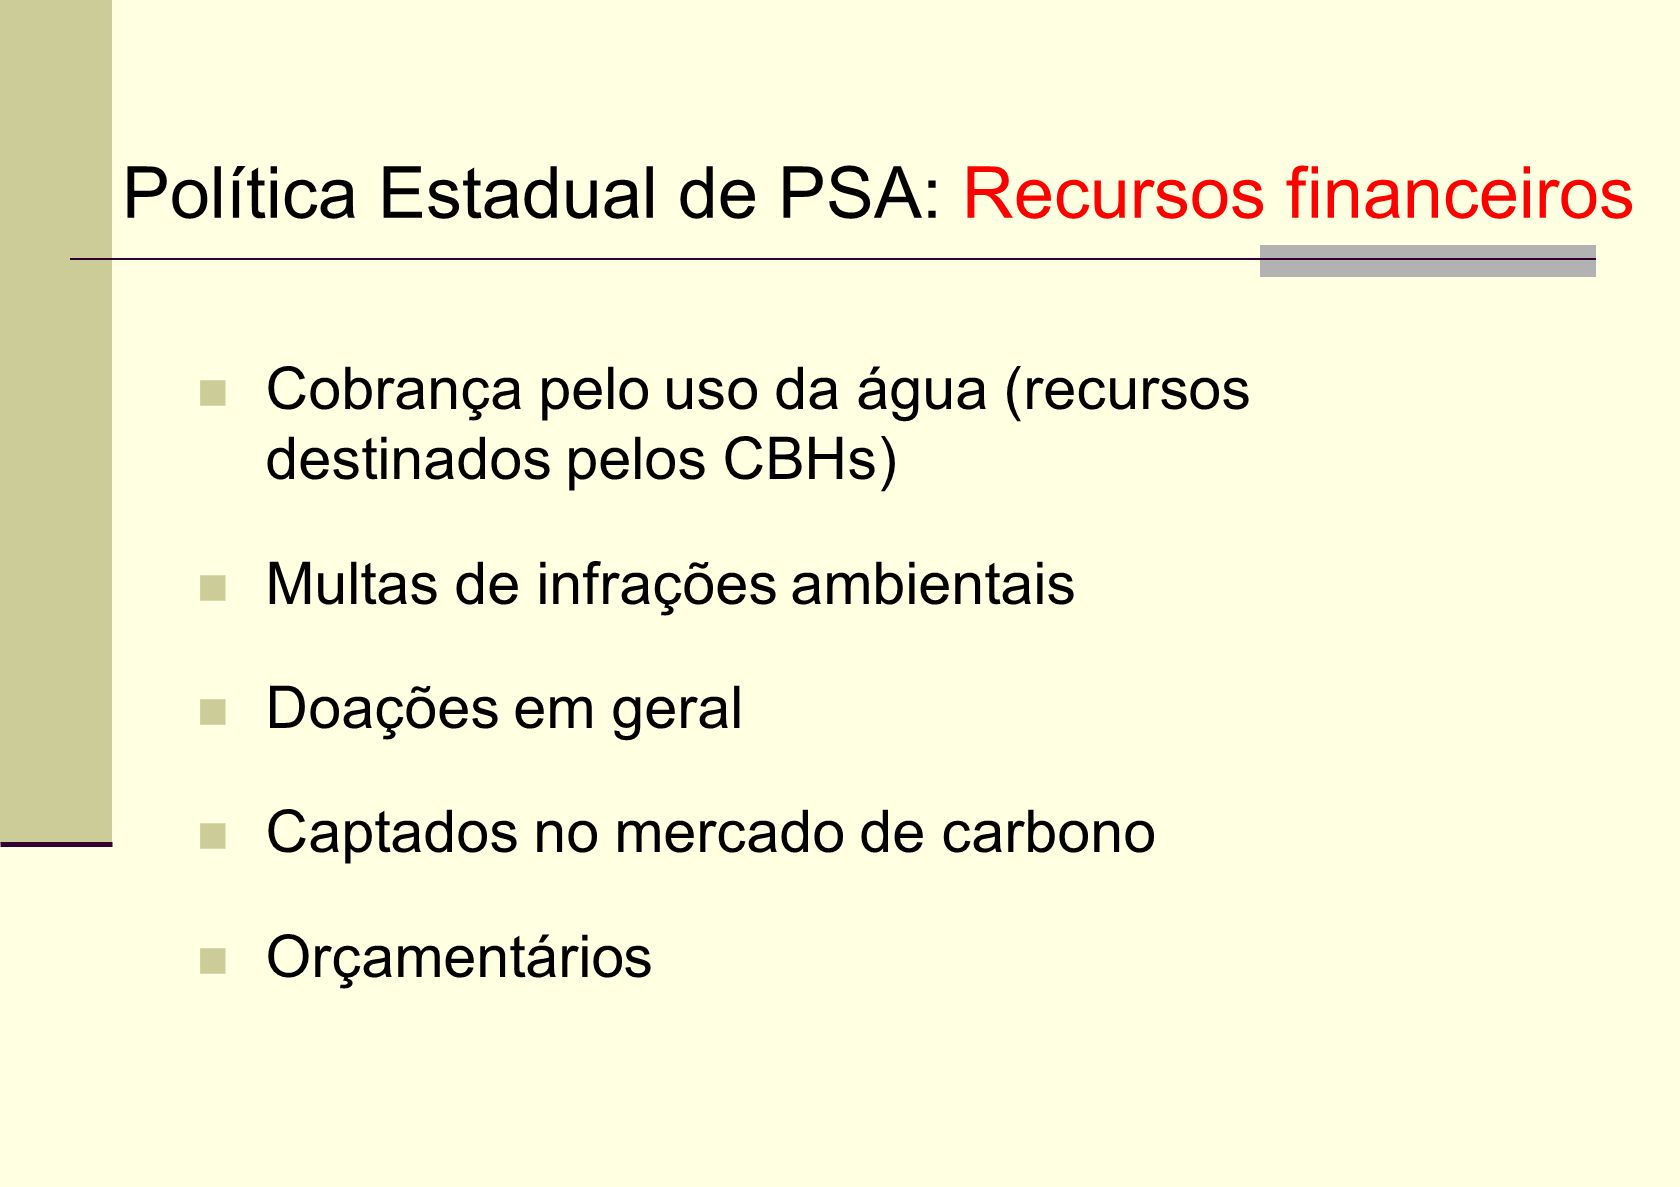 Política Estadual de PSA: Recursos financeiros